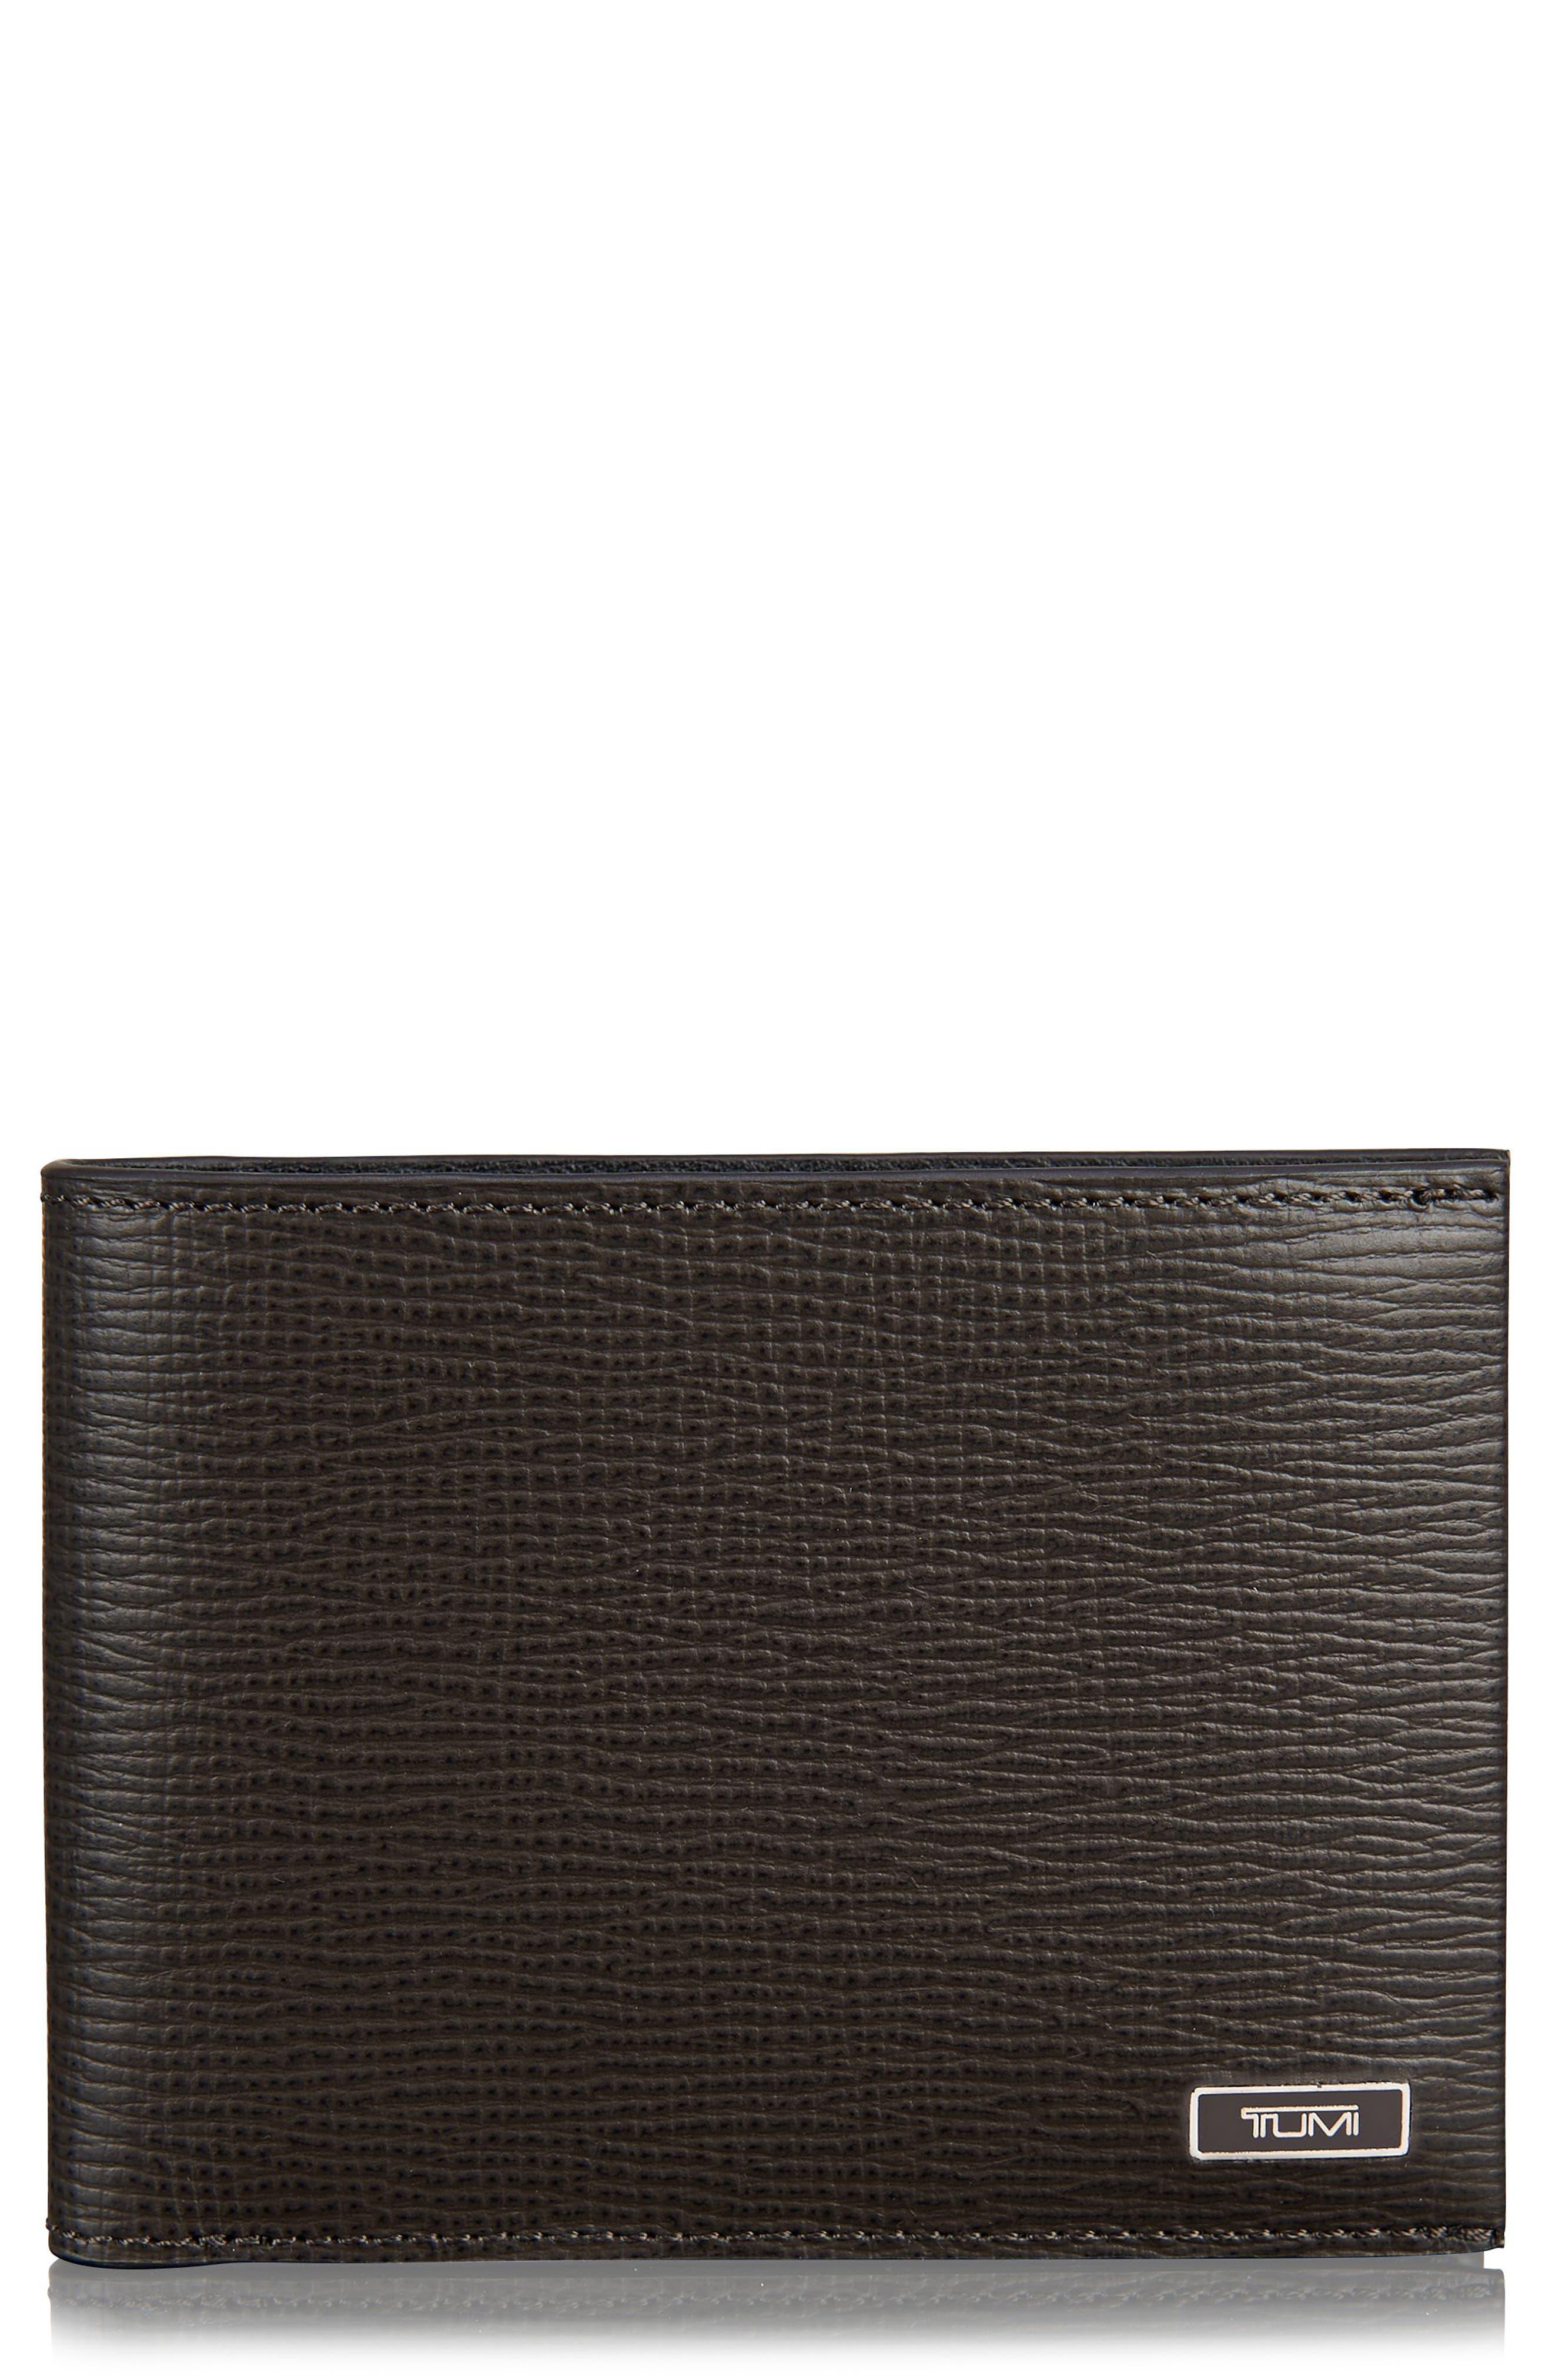 Monaco Leather Wallet,                             Main thumbnail 1, color,                             Taupe